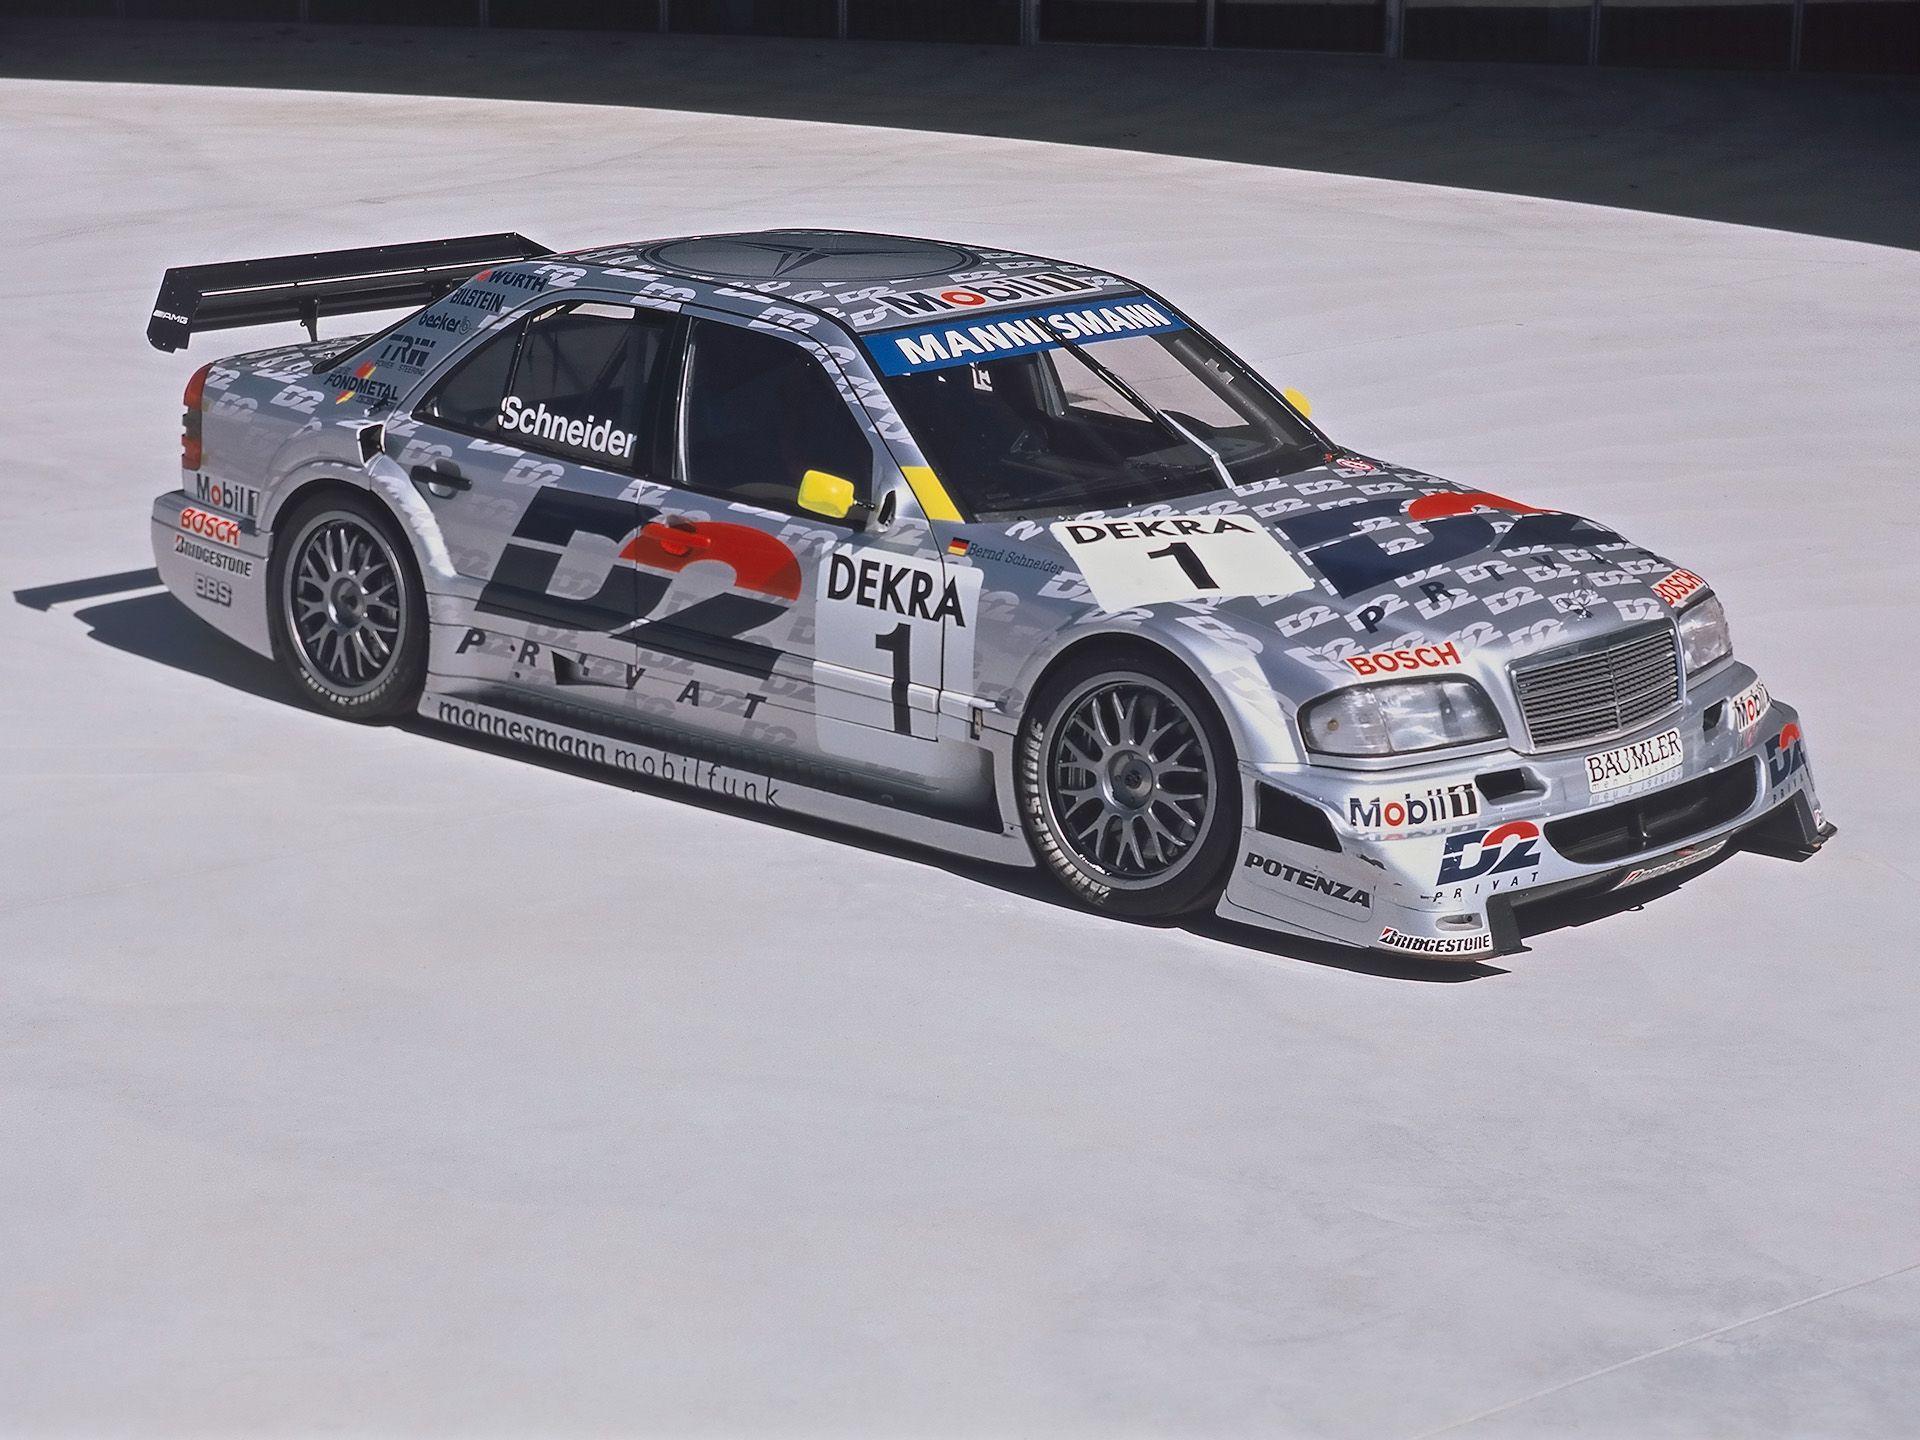 Dtm itc amg mercedes c klasse w202 1994 1996 starting for Mercedes benz touring car